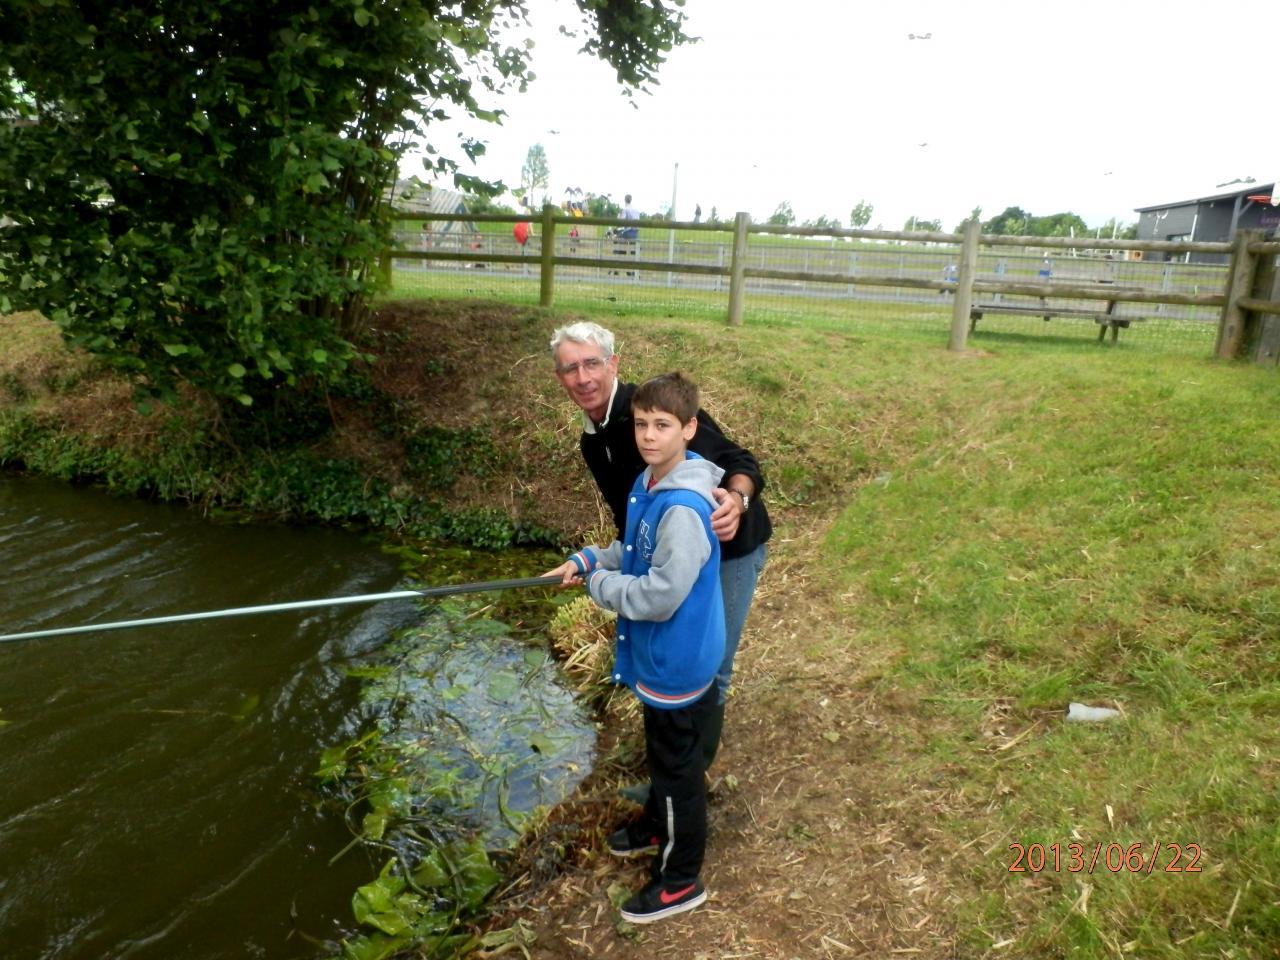 Fishing Days 2013